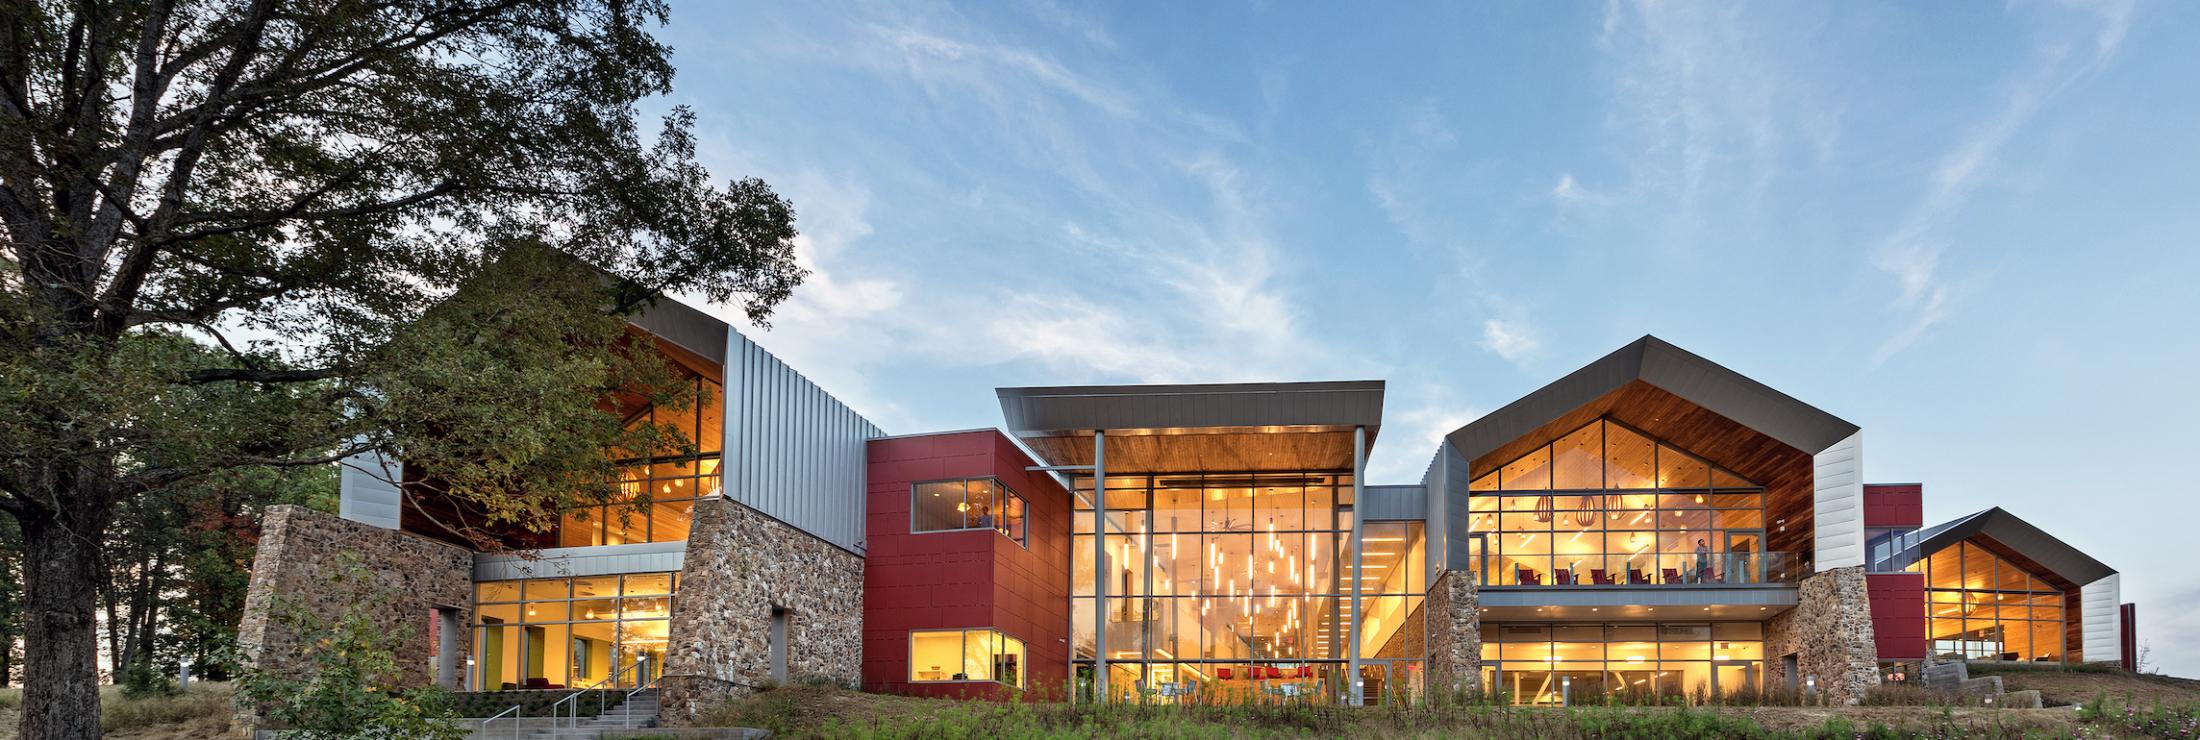 Cladding Corp Swisspearl Varina Area Library - Richmond, VA